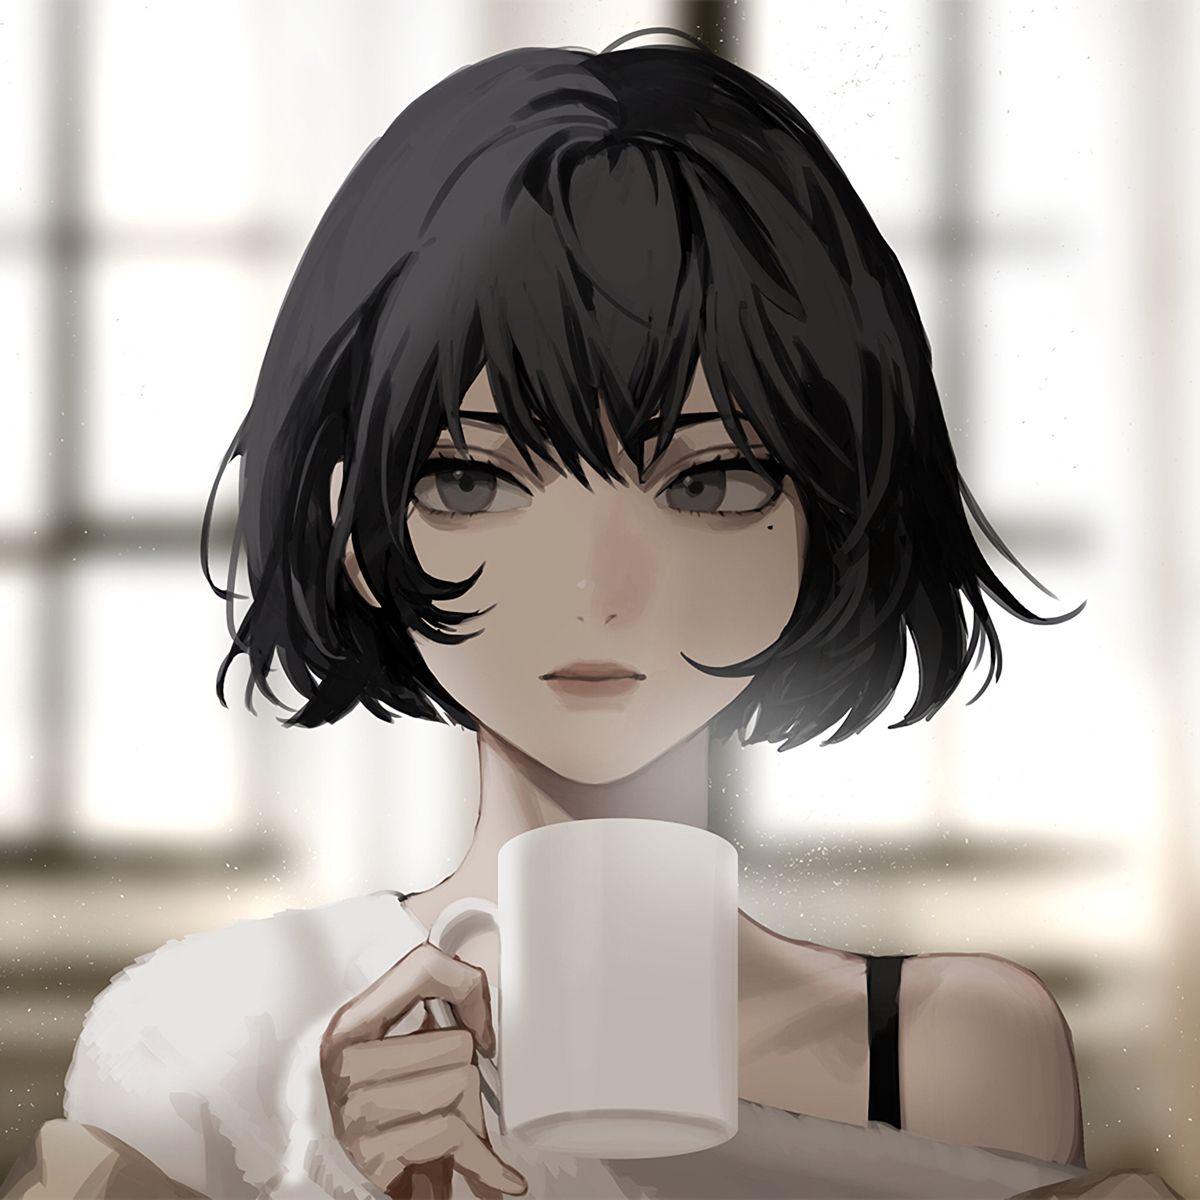 Pin on Anime & Art